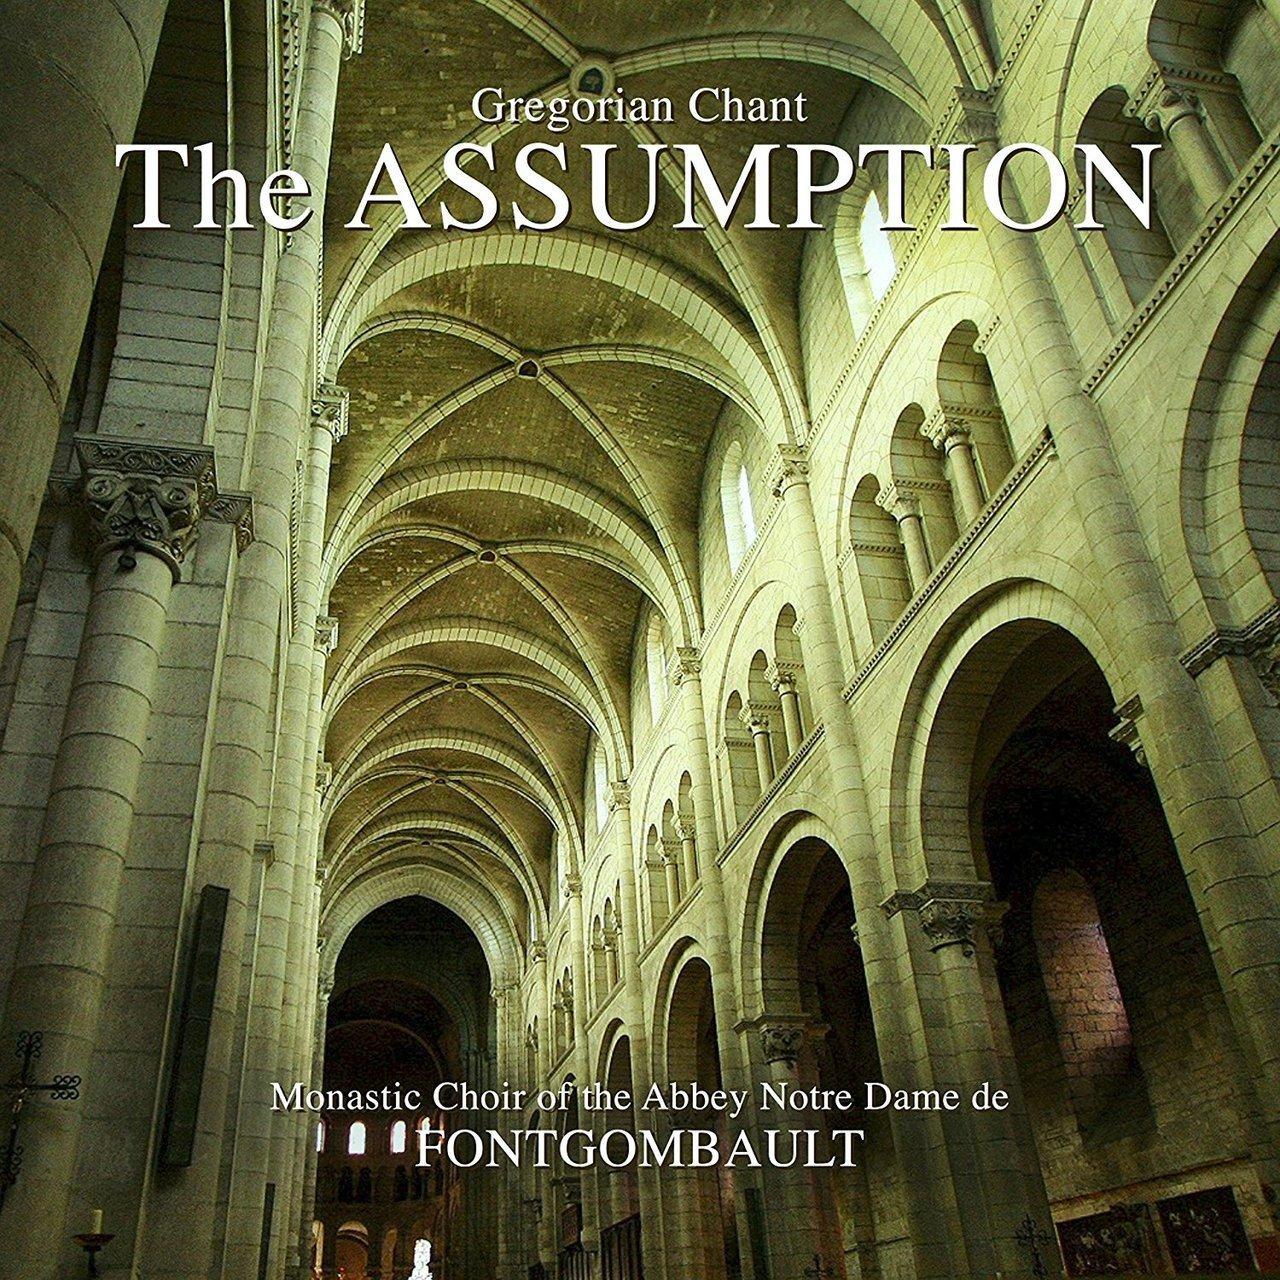 The assumption   gregorian chant by monastic choir of the abbey notre dame de fontgombault